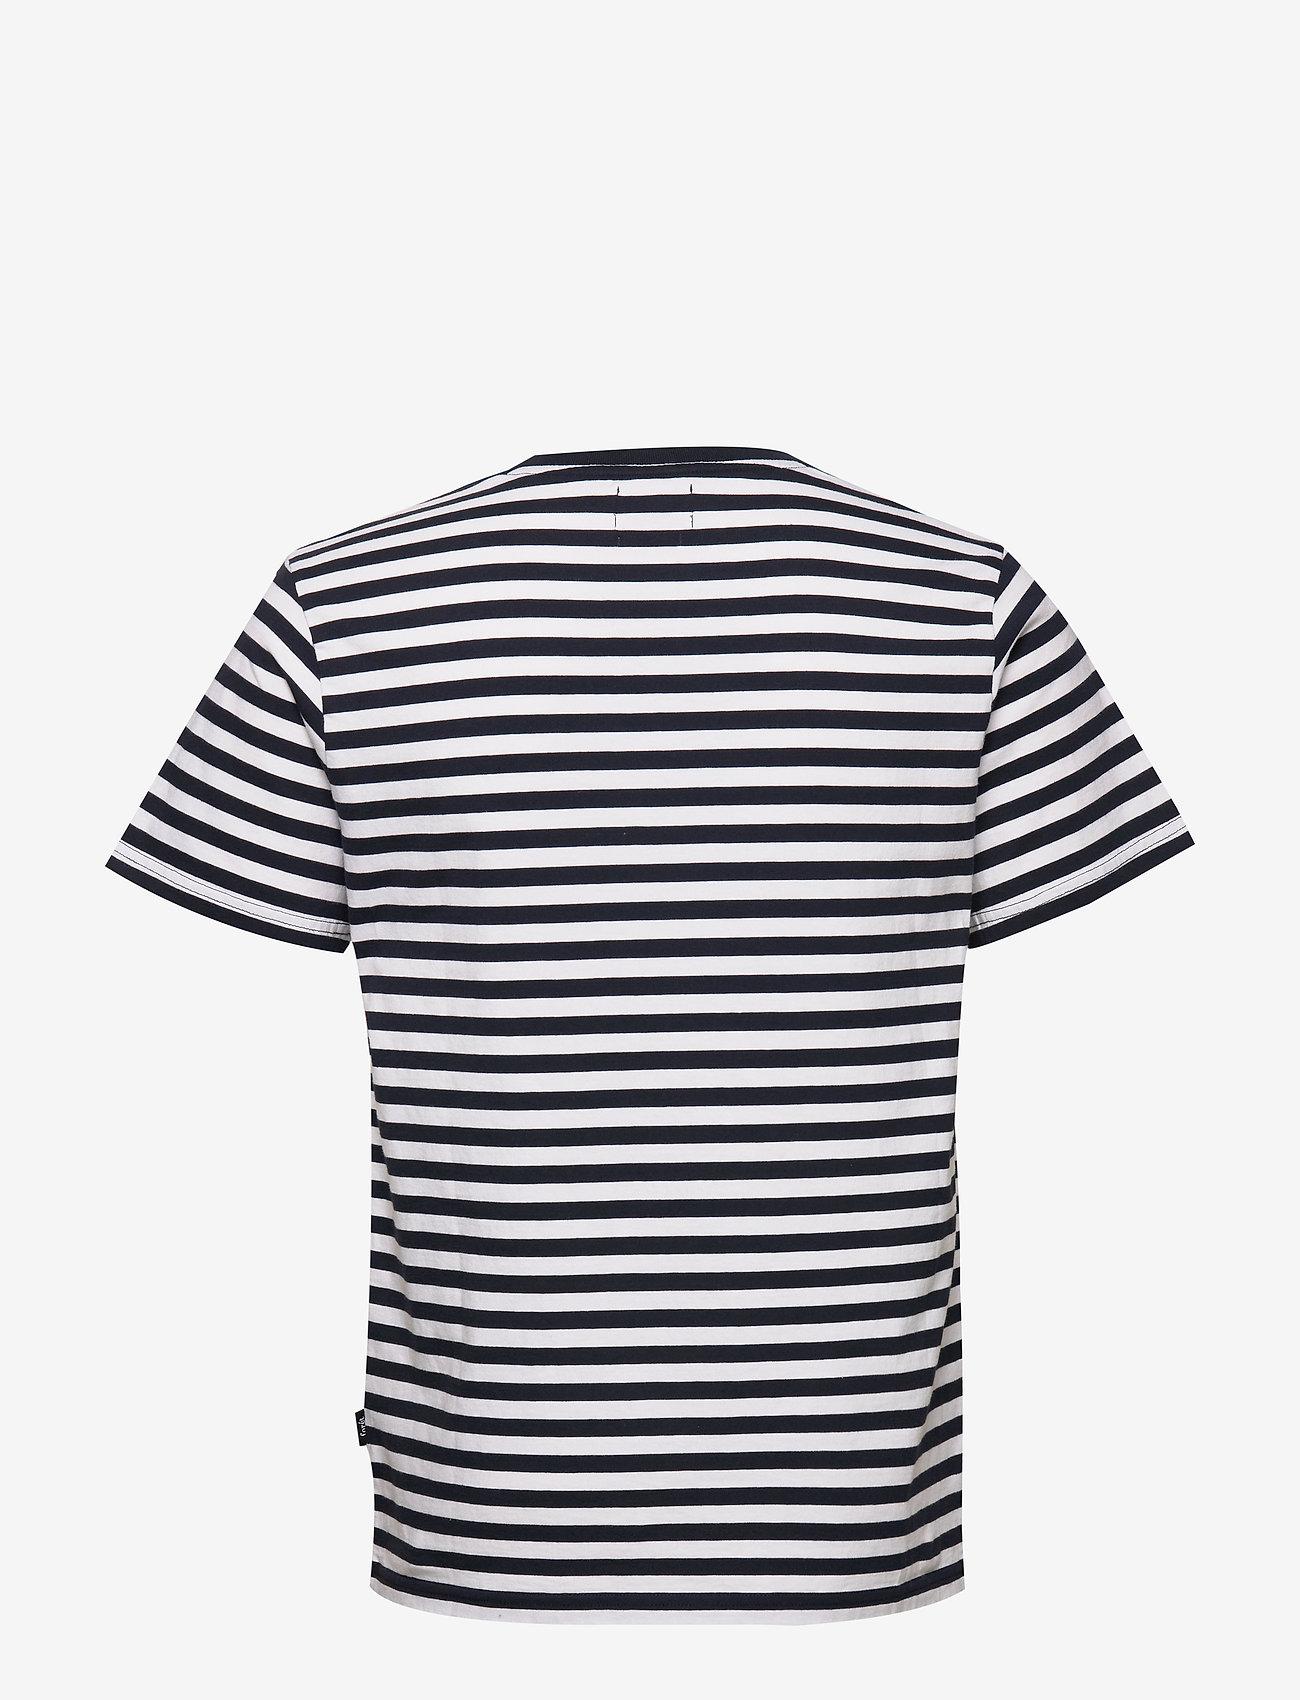 Forét Hawk T-shirt - T-shirts